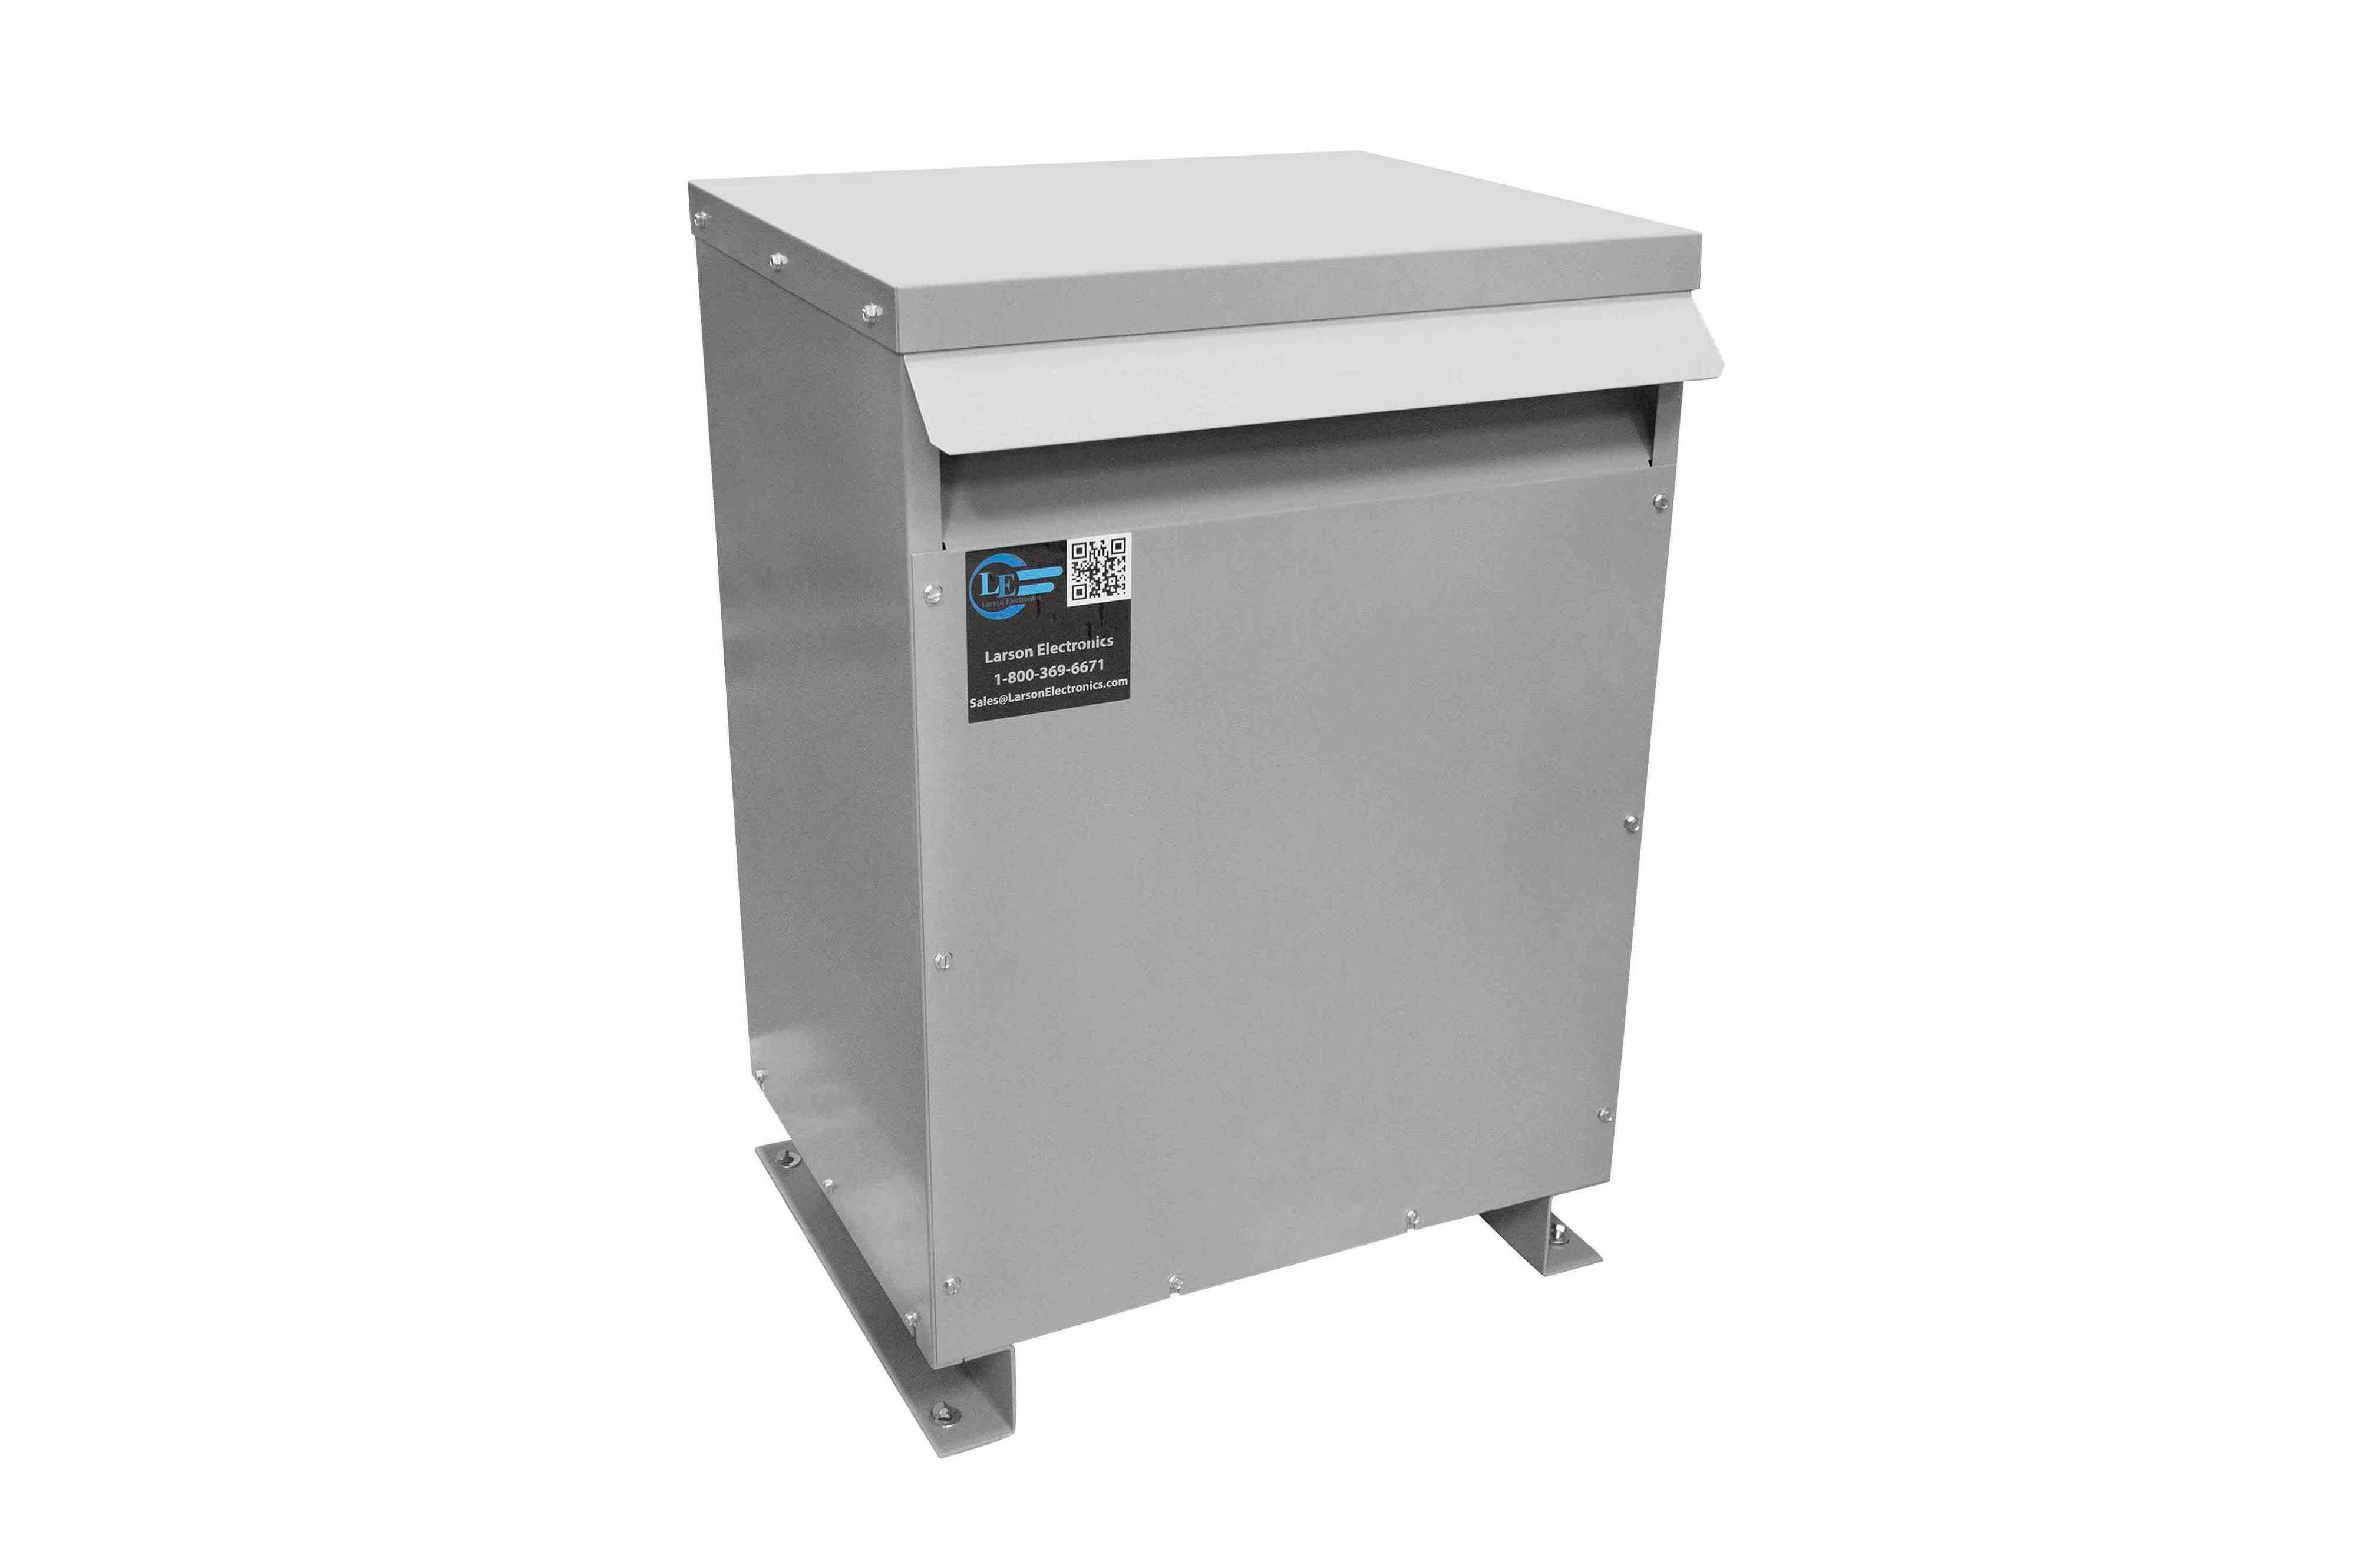 60 kVA 3PH Isolation Transformer, 240V Wye Primary, 415V Delta Secondary, N3R, Ventilated, 60 Hz